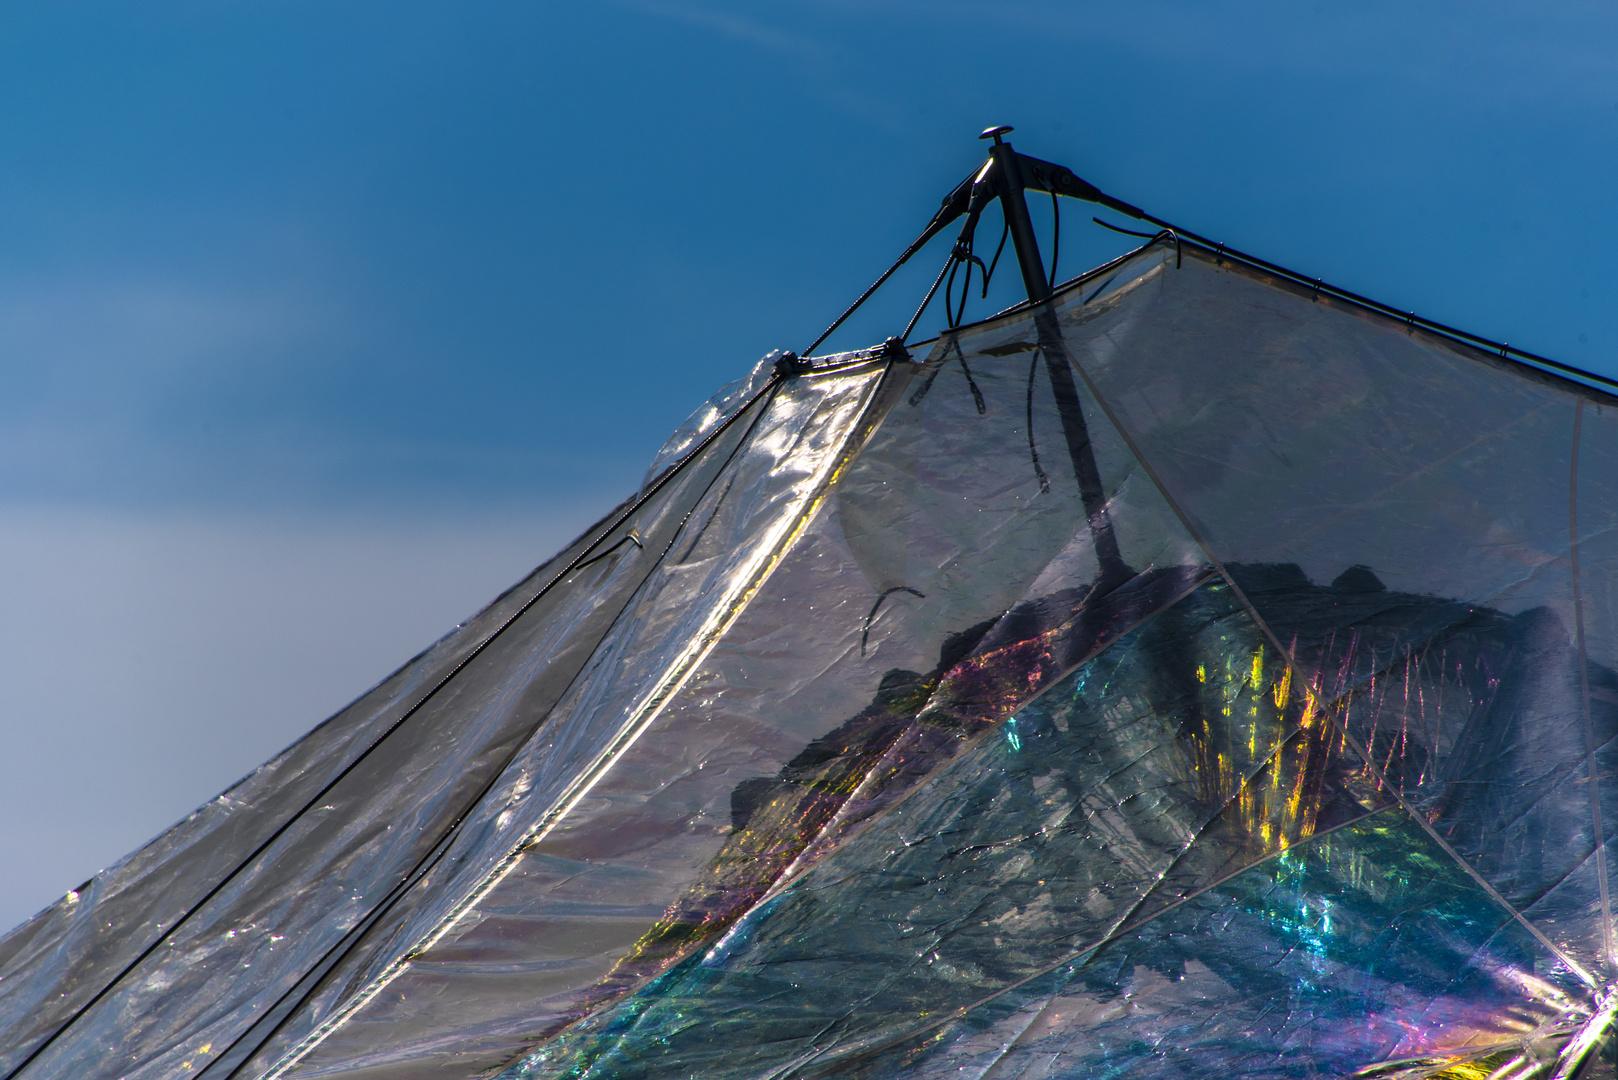 spektrale Lichtzerlegung am Fiberglaspavillon